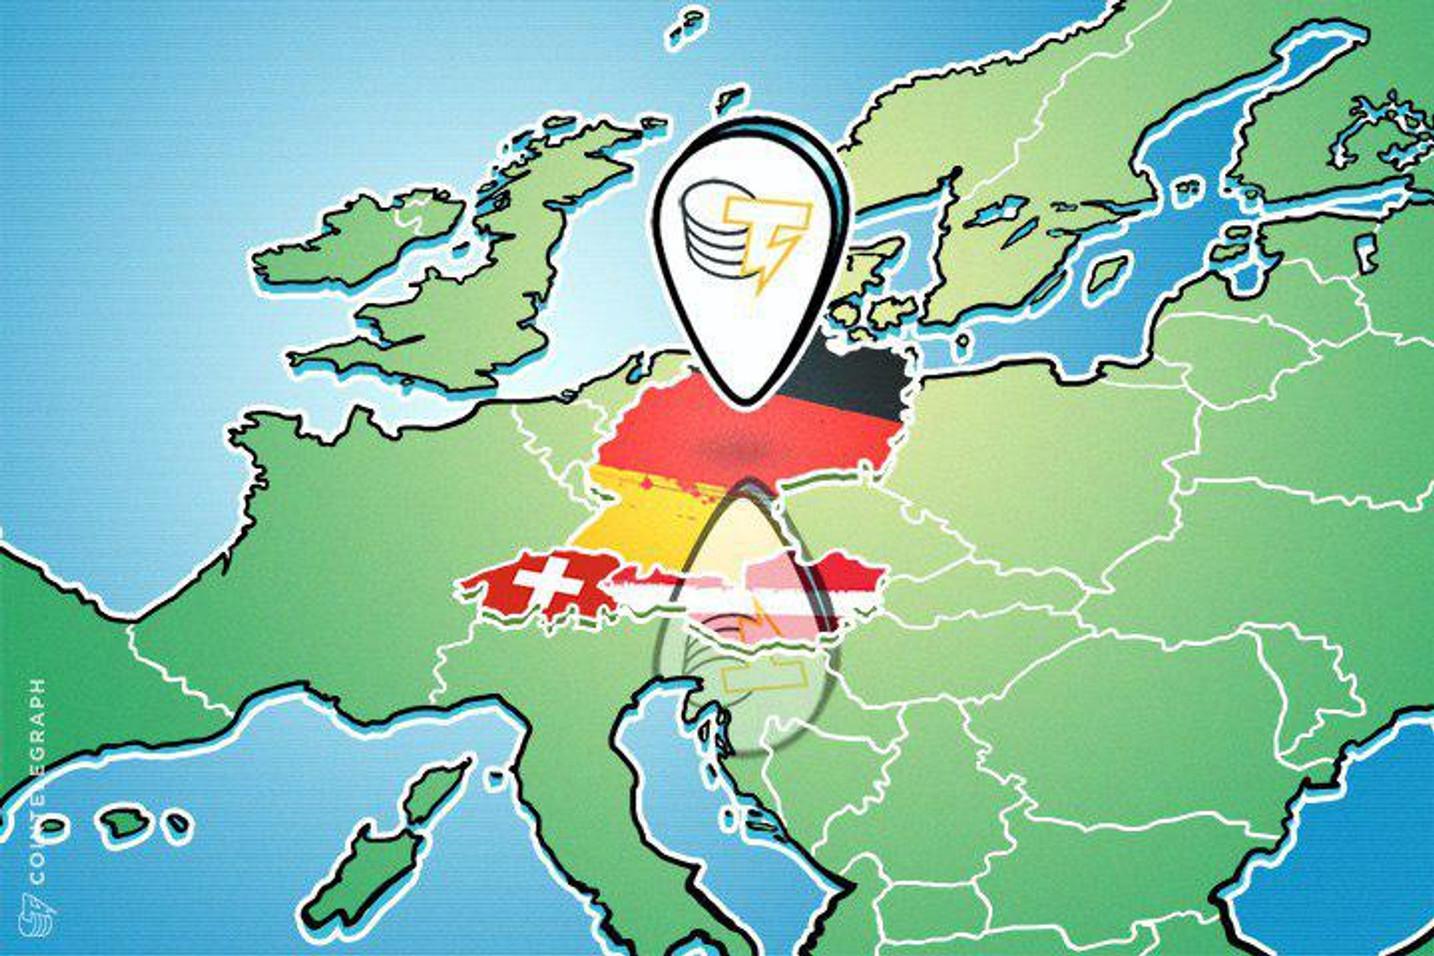 Sprechen Sie Deutsch? Cointelegraph pokreće nemačku verziju